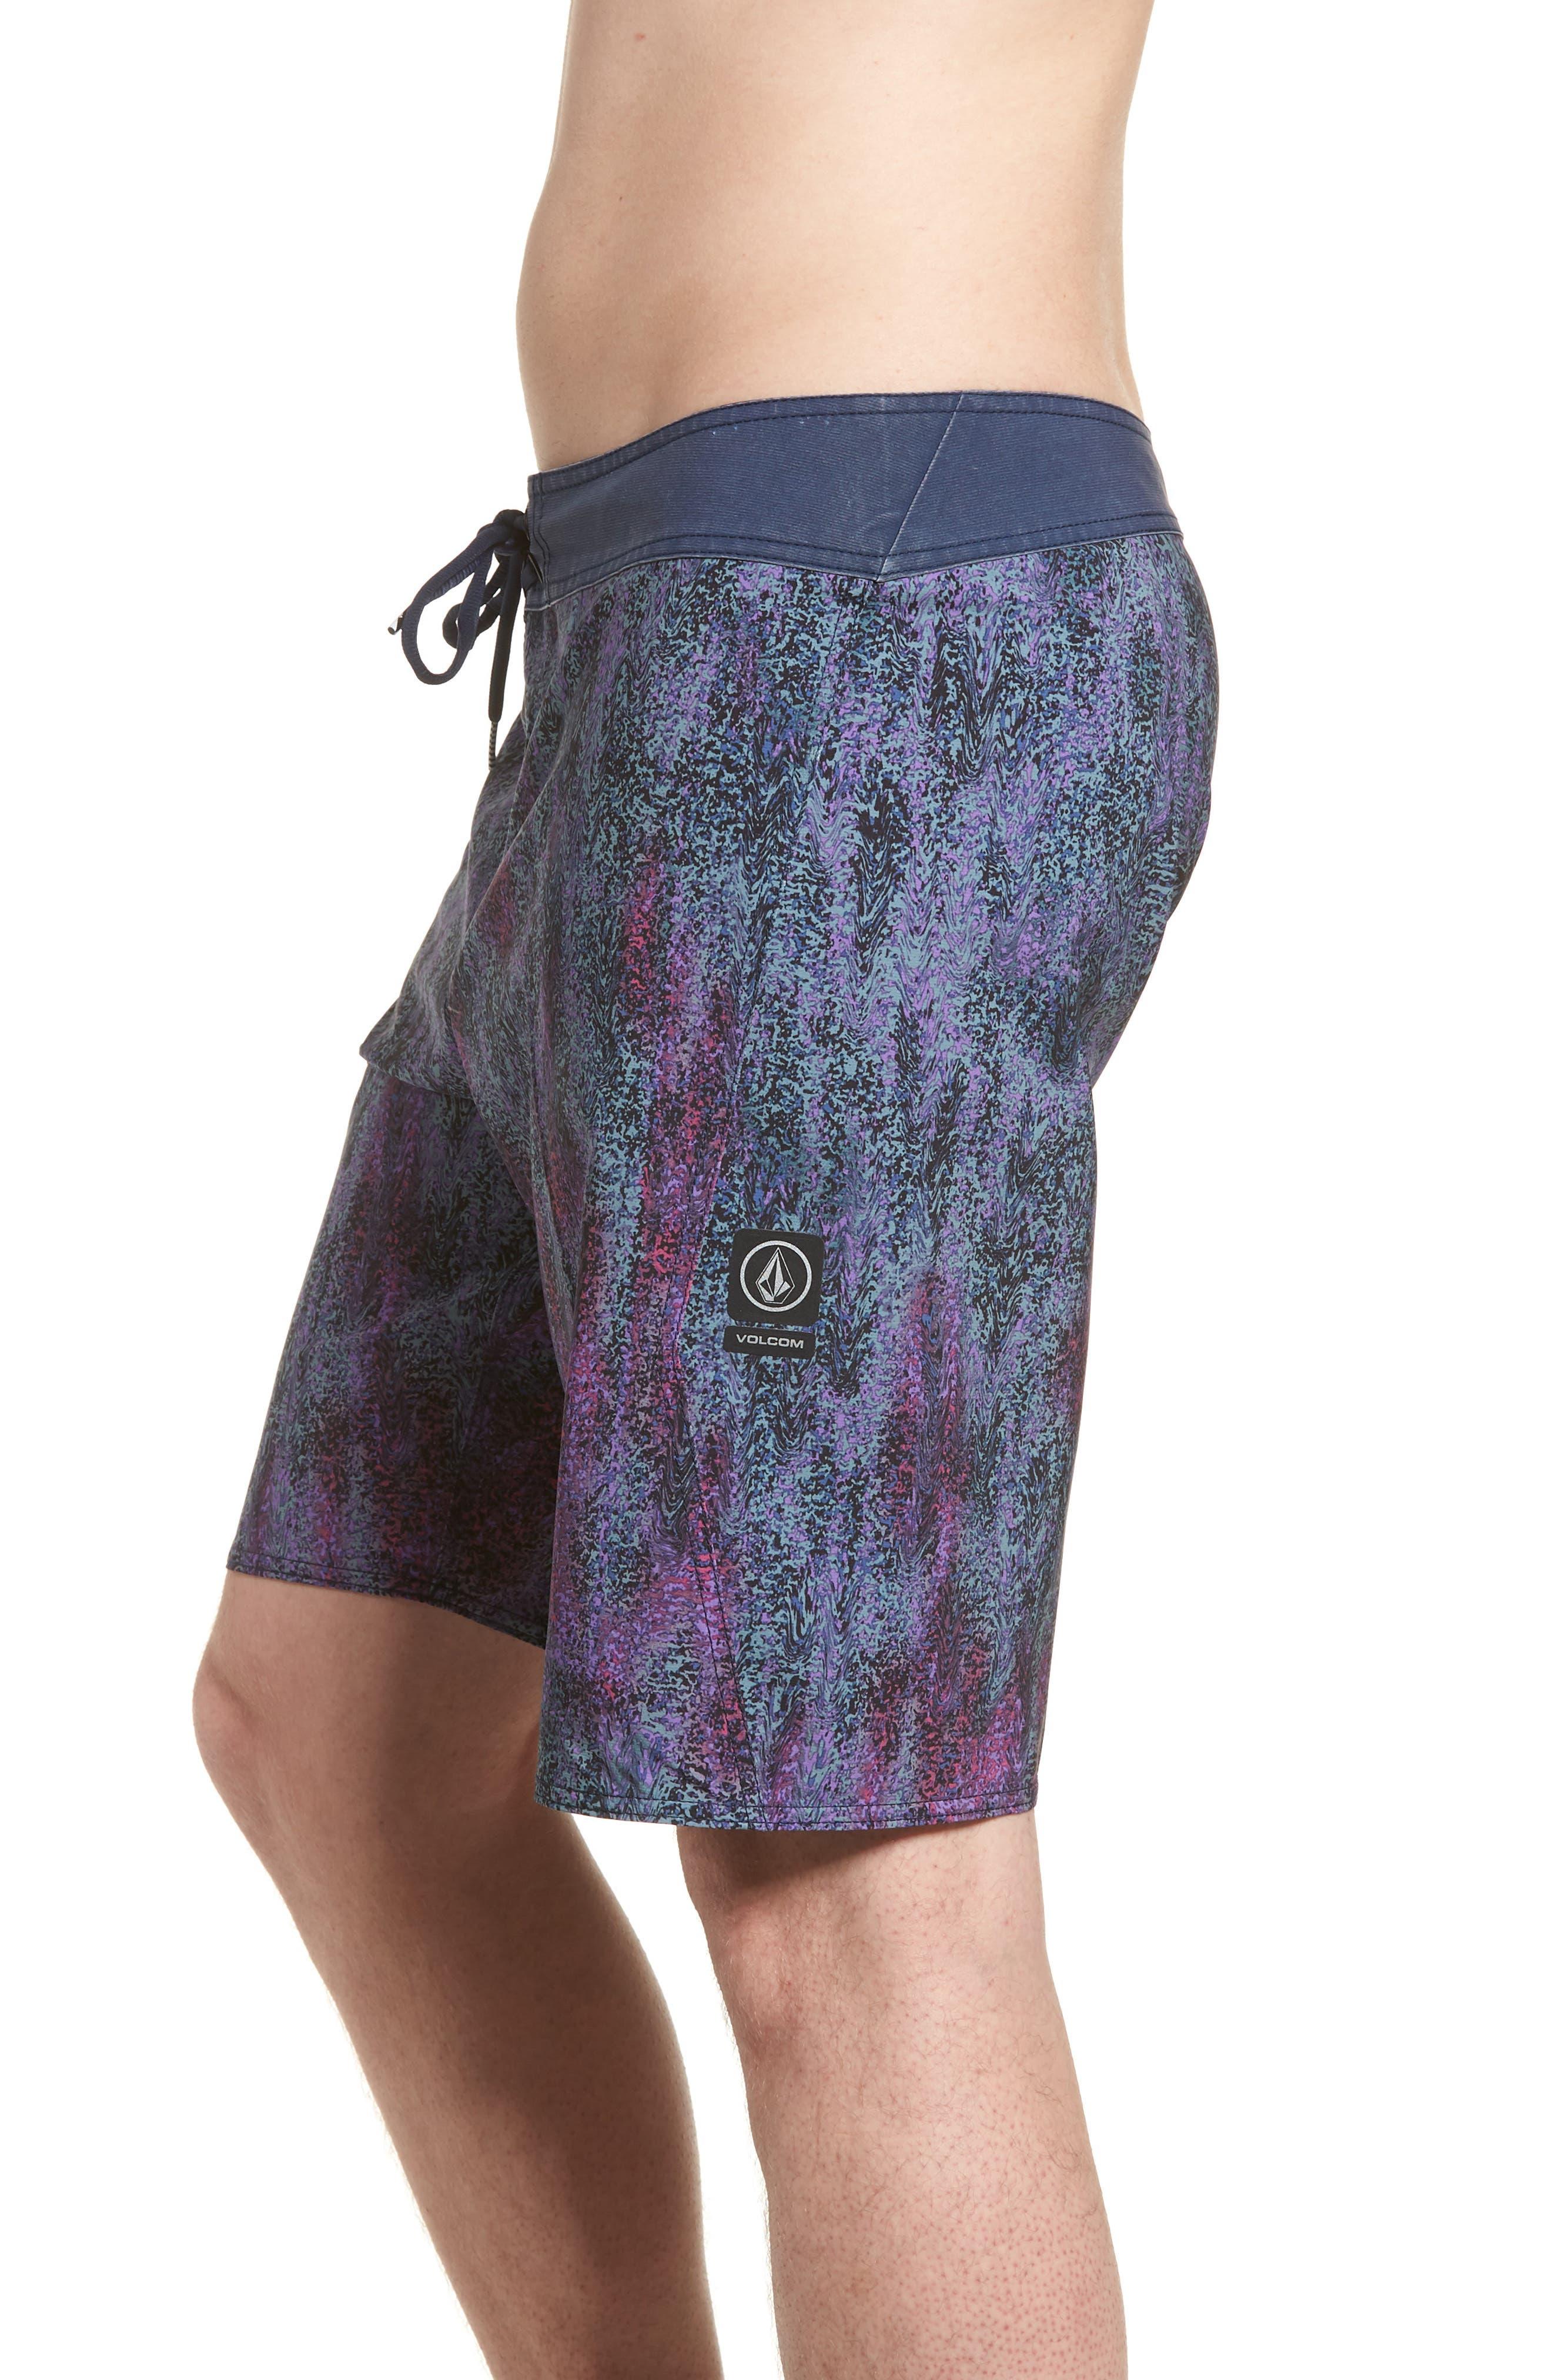 Plasm Mod Board Shorts,                             Alternate thumbnail 3, color,                             Indigo